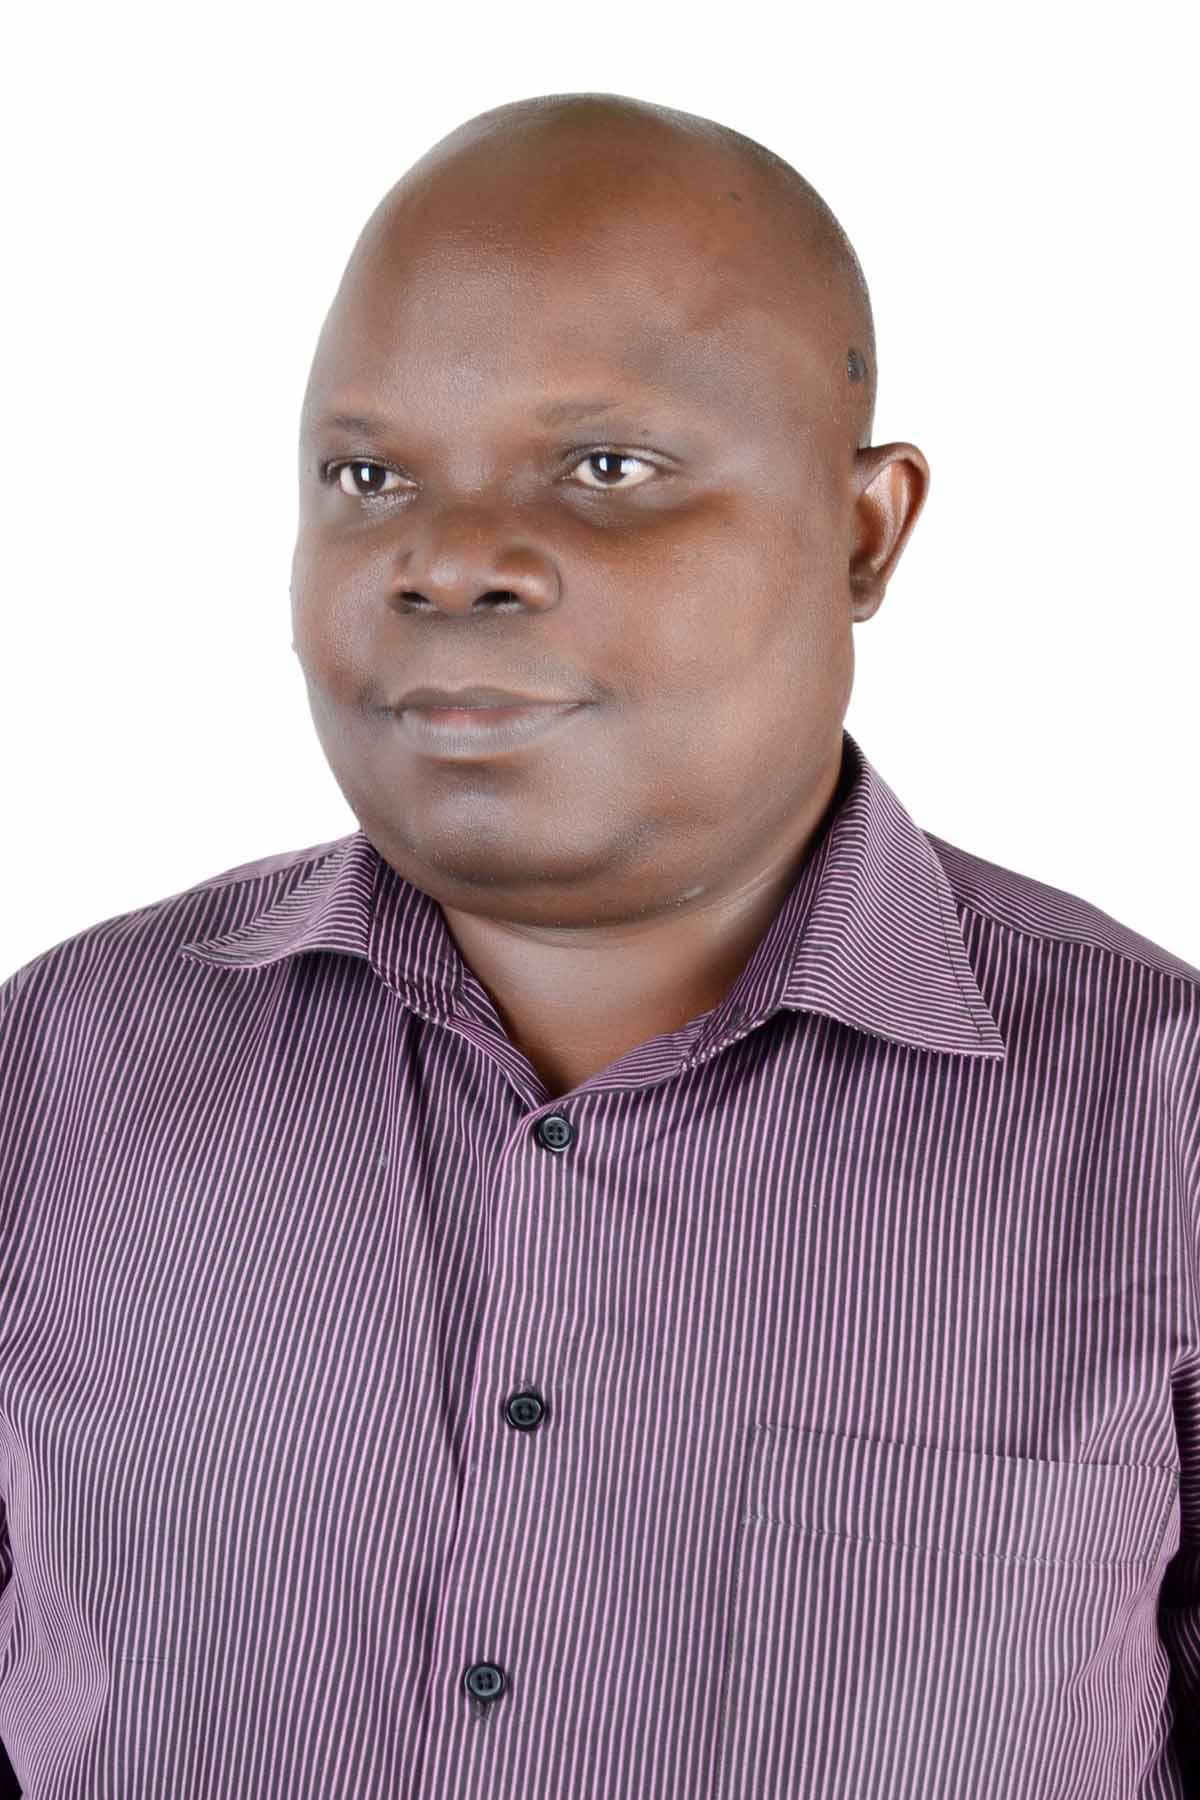 Joseph Matovu, PhD    Fellowship Site: Makerere University, Kampala, Uganda U.S. Institution: Yale University   Email